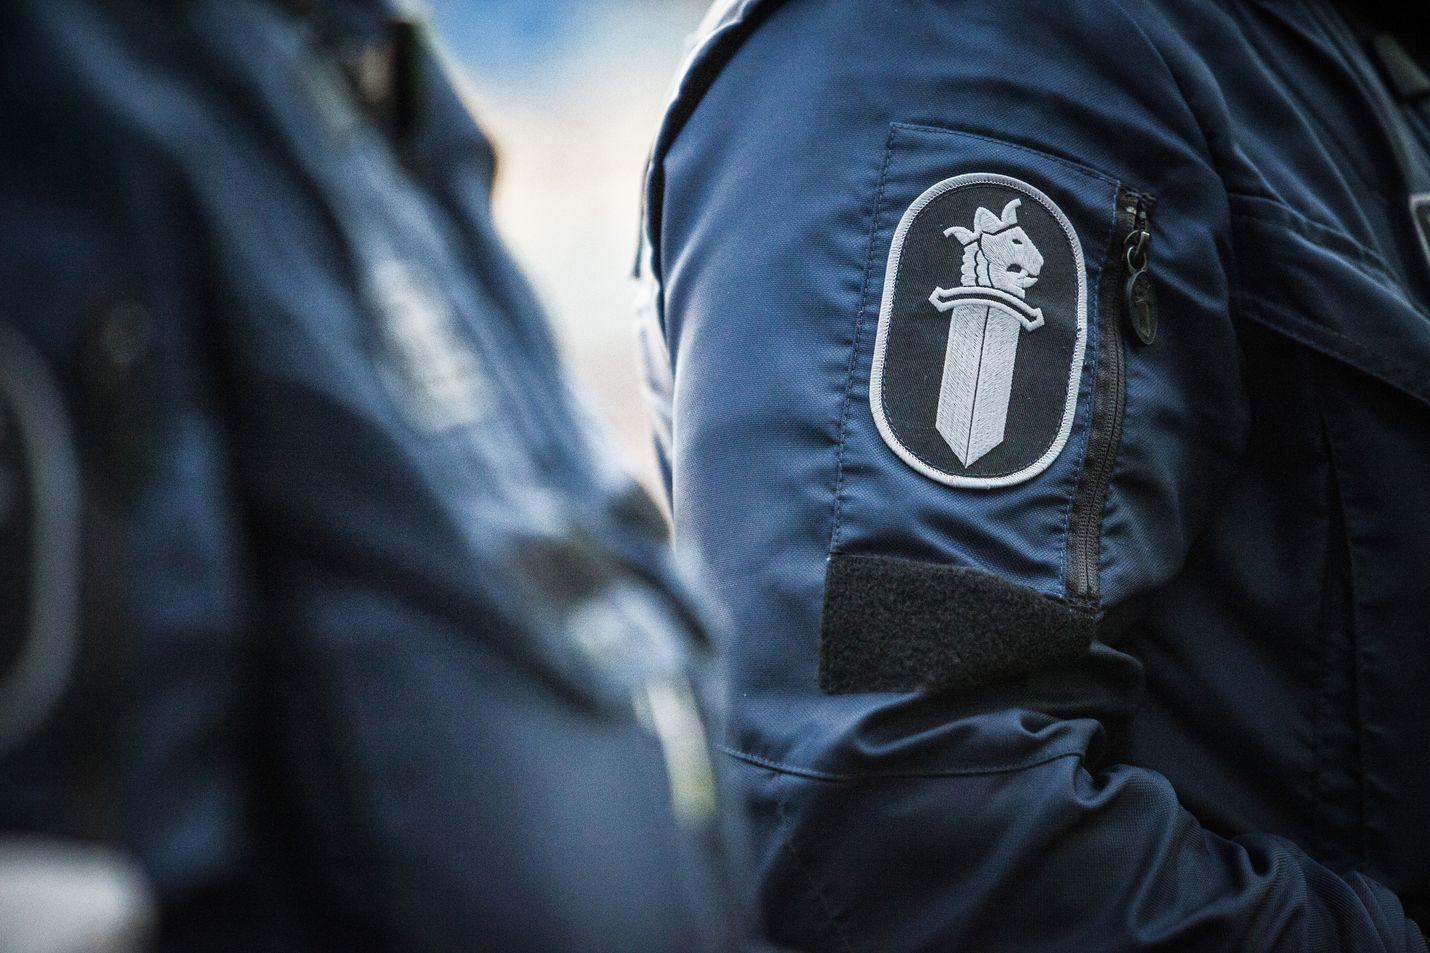 Poliisin Kuvapalvelu